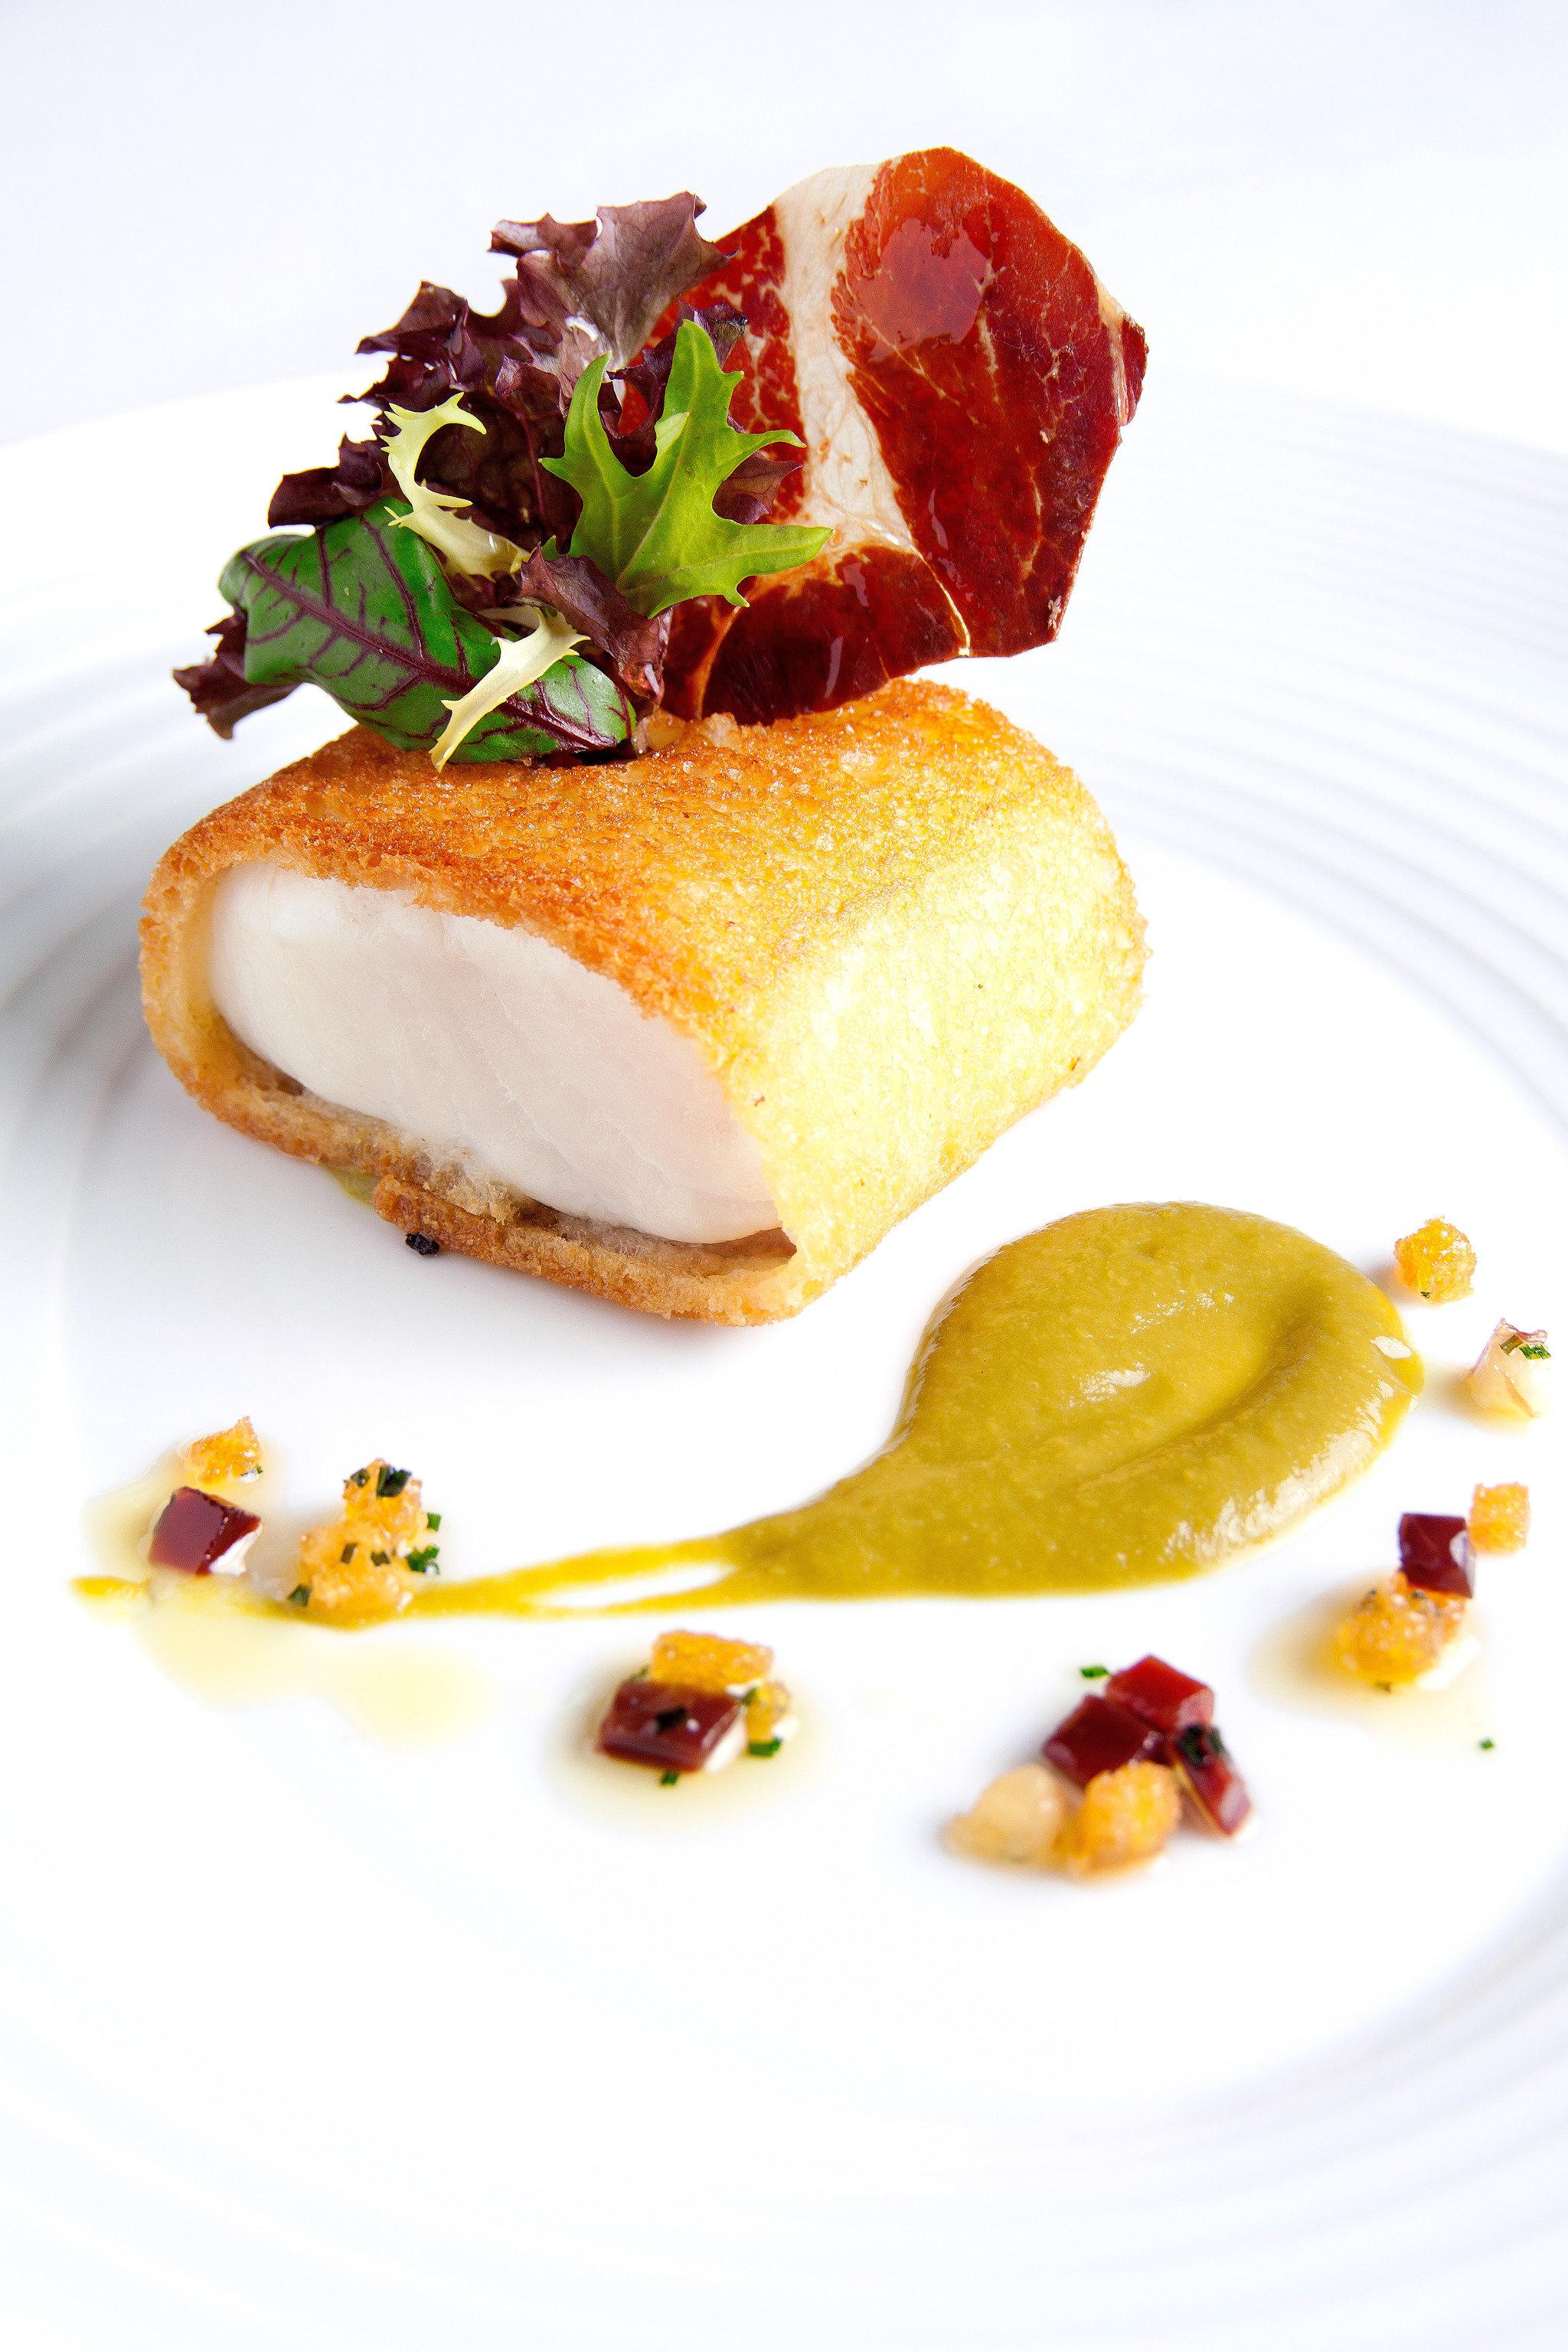 Bar Dining Drink Eat Elegant Historic plate food piece slice breakfast cuisine meat dessert arranged